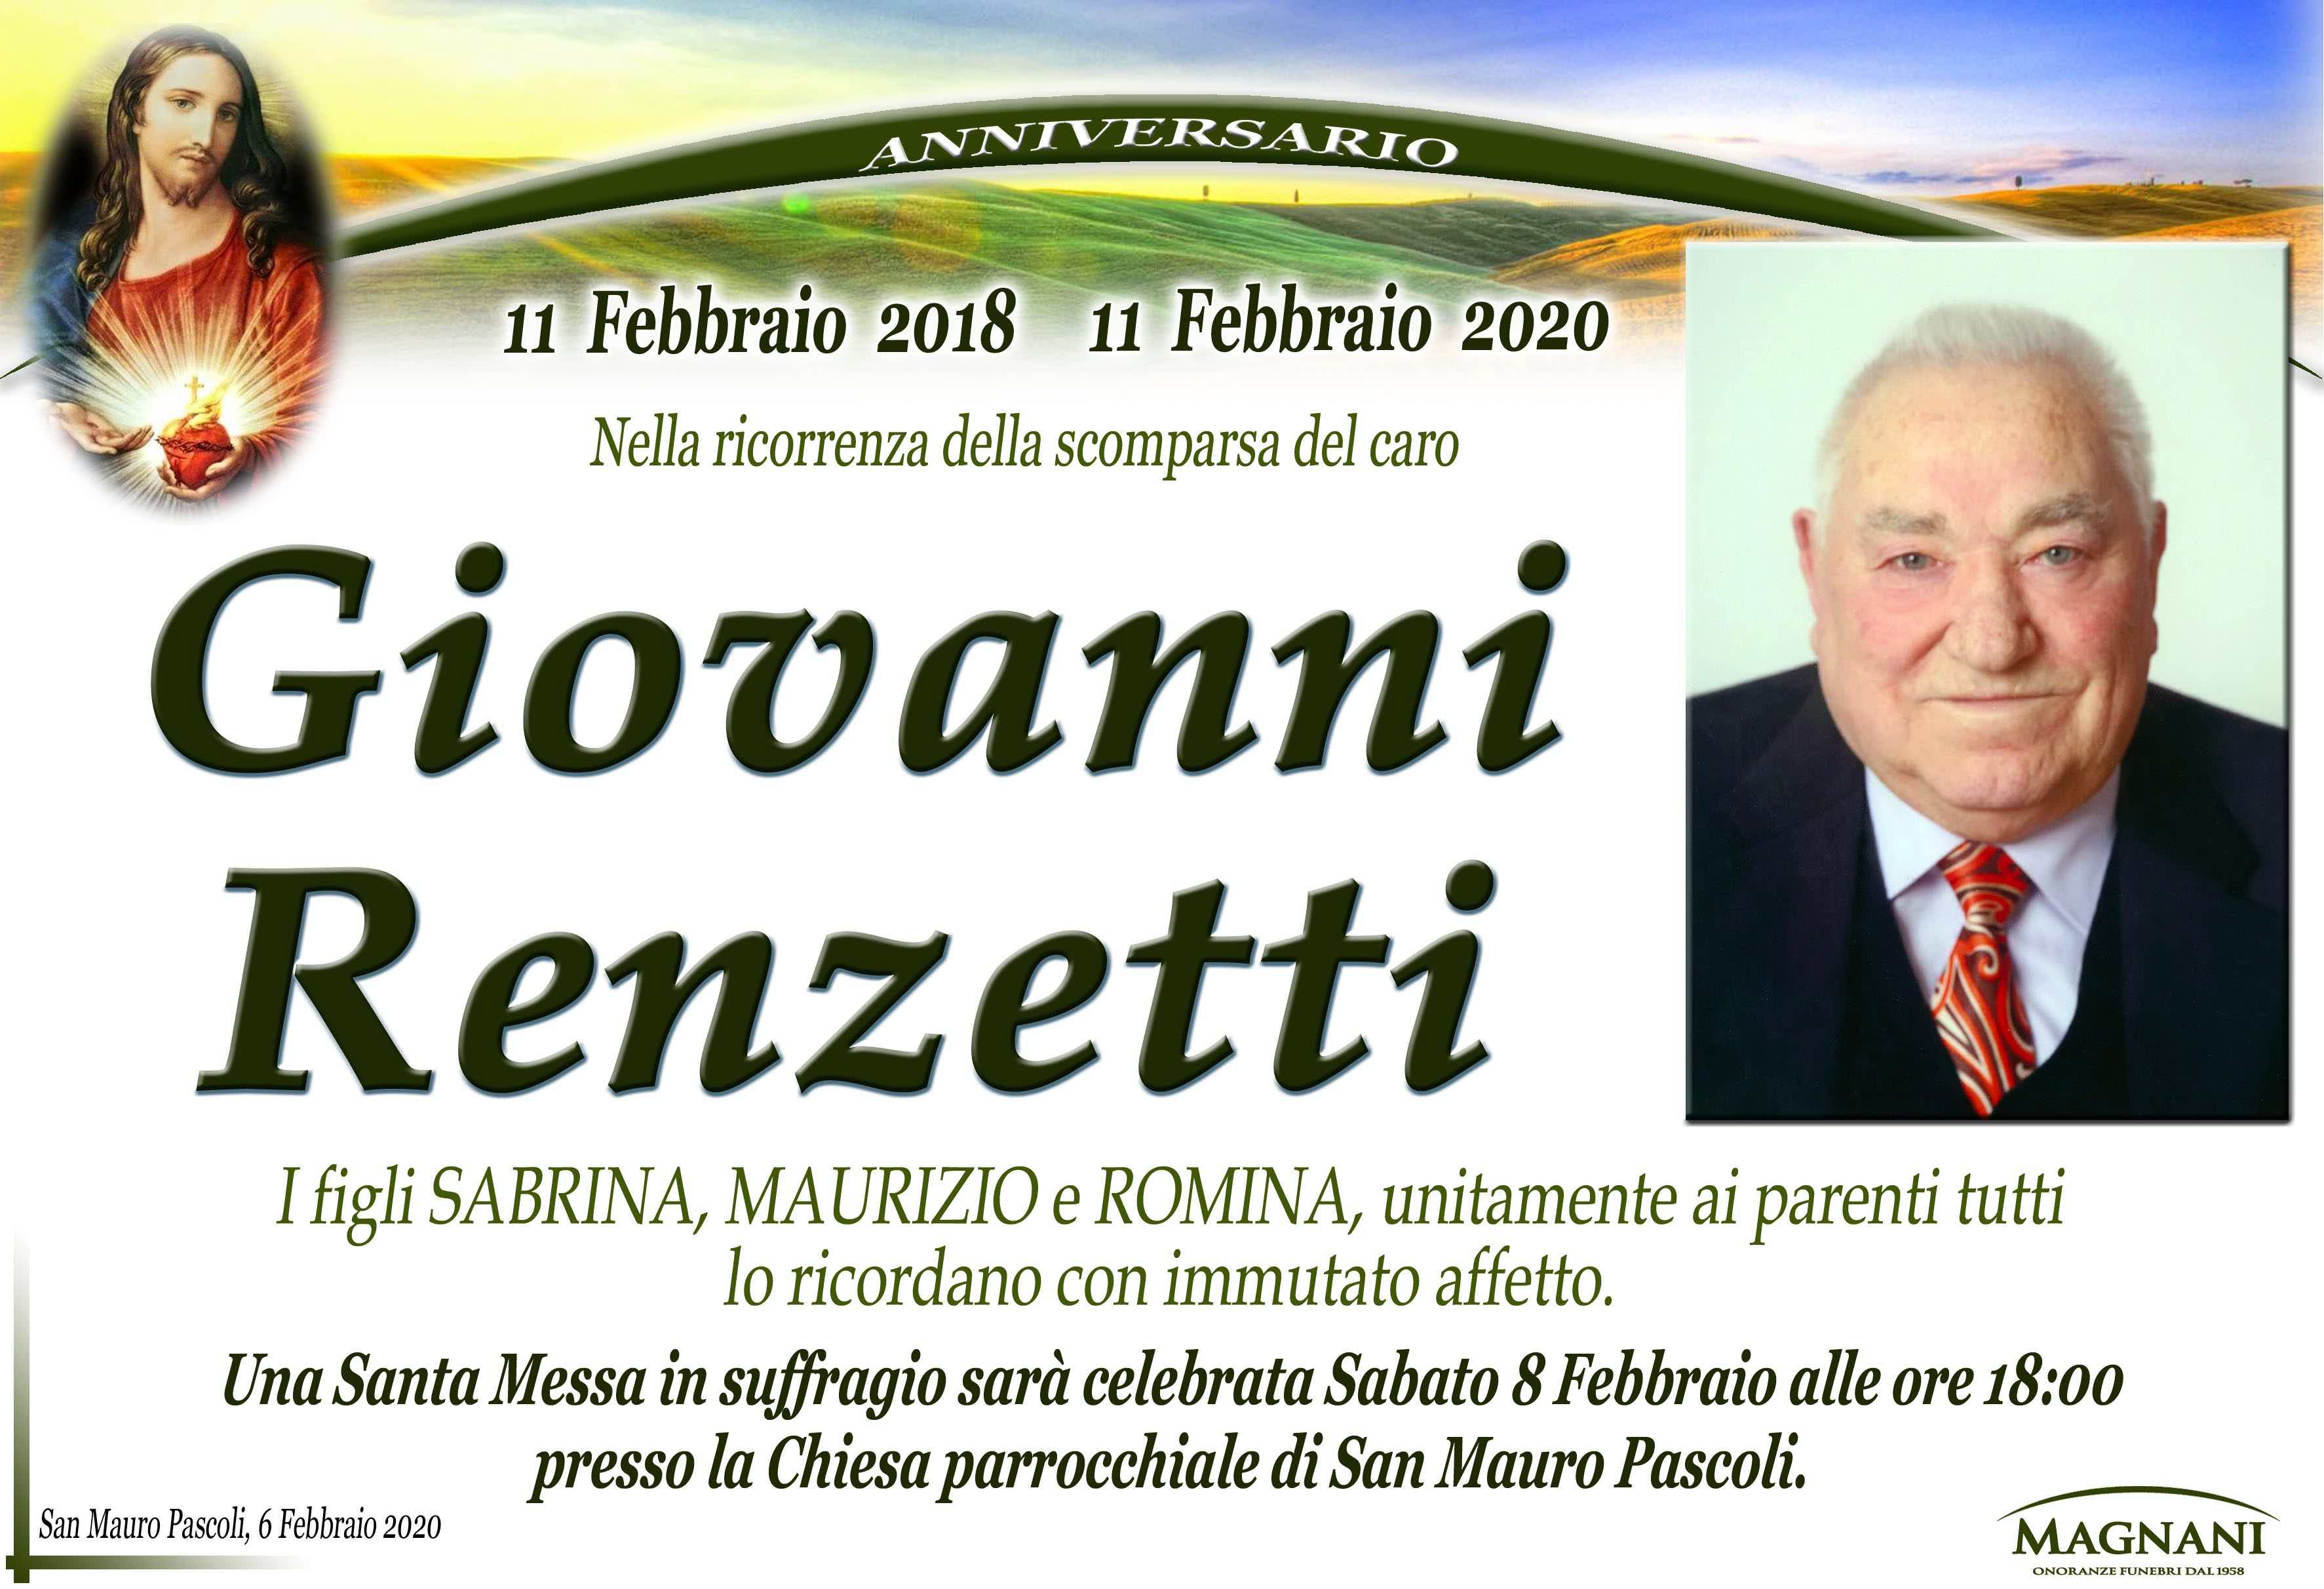 Giovanni Renzetti